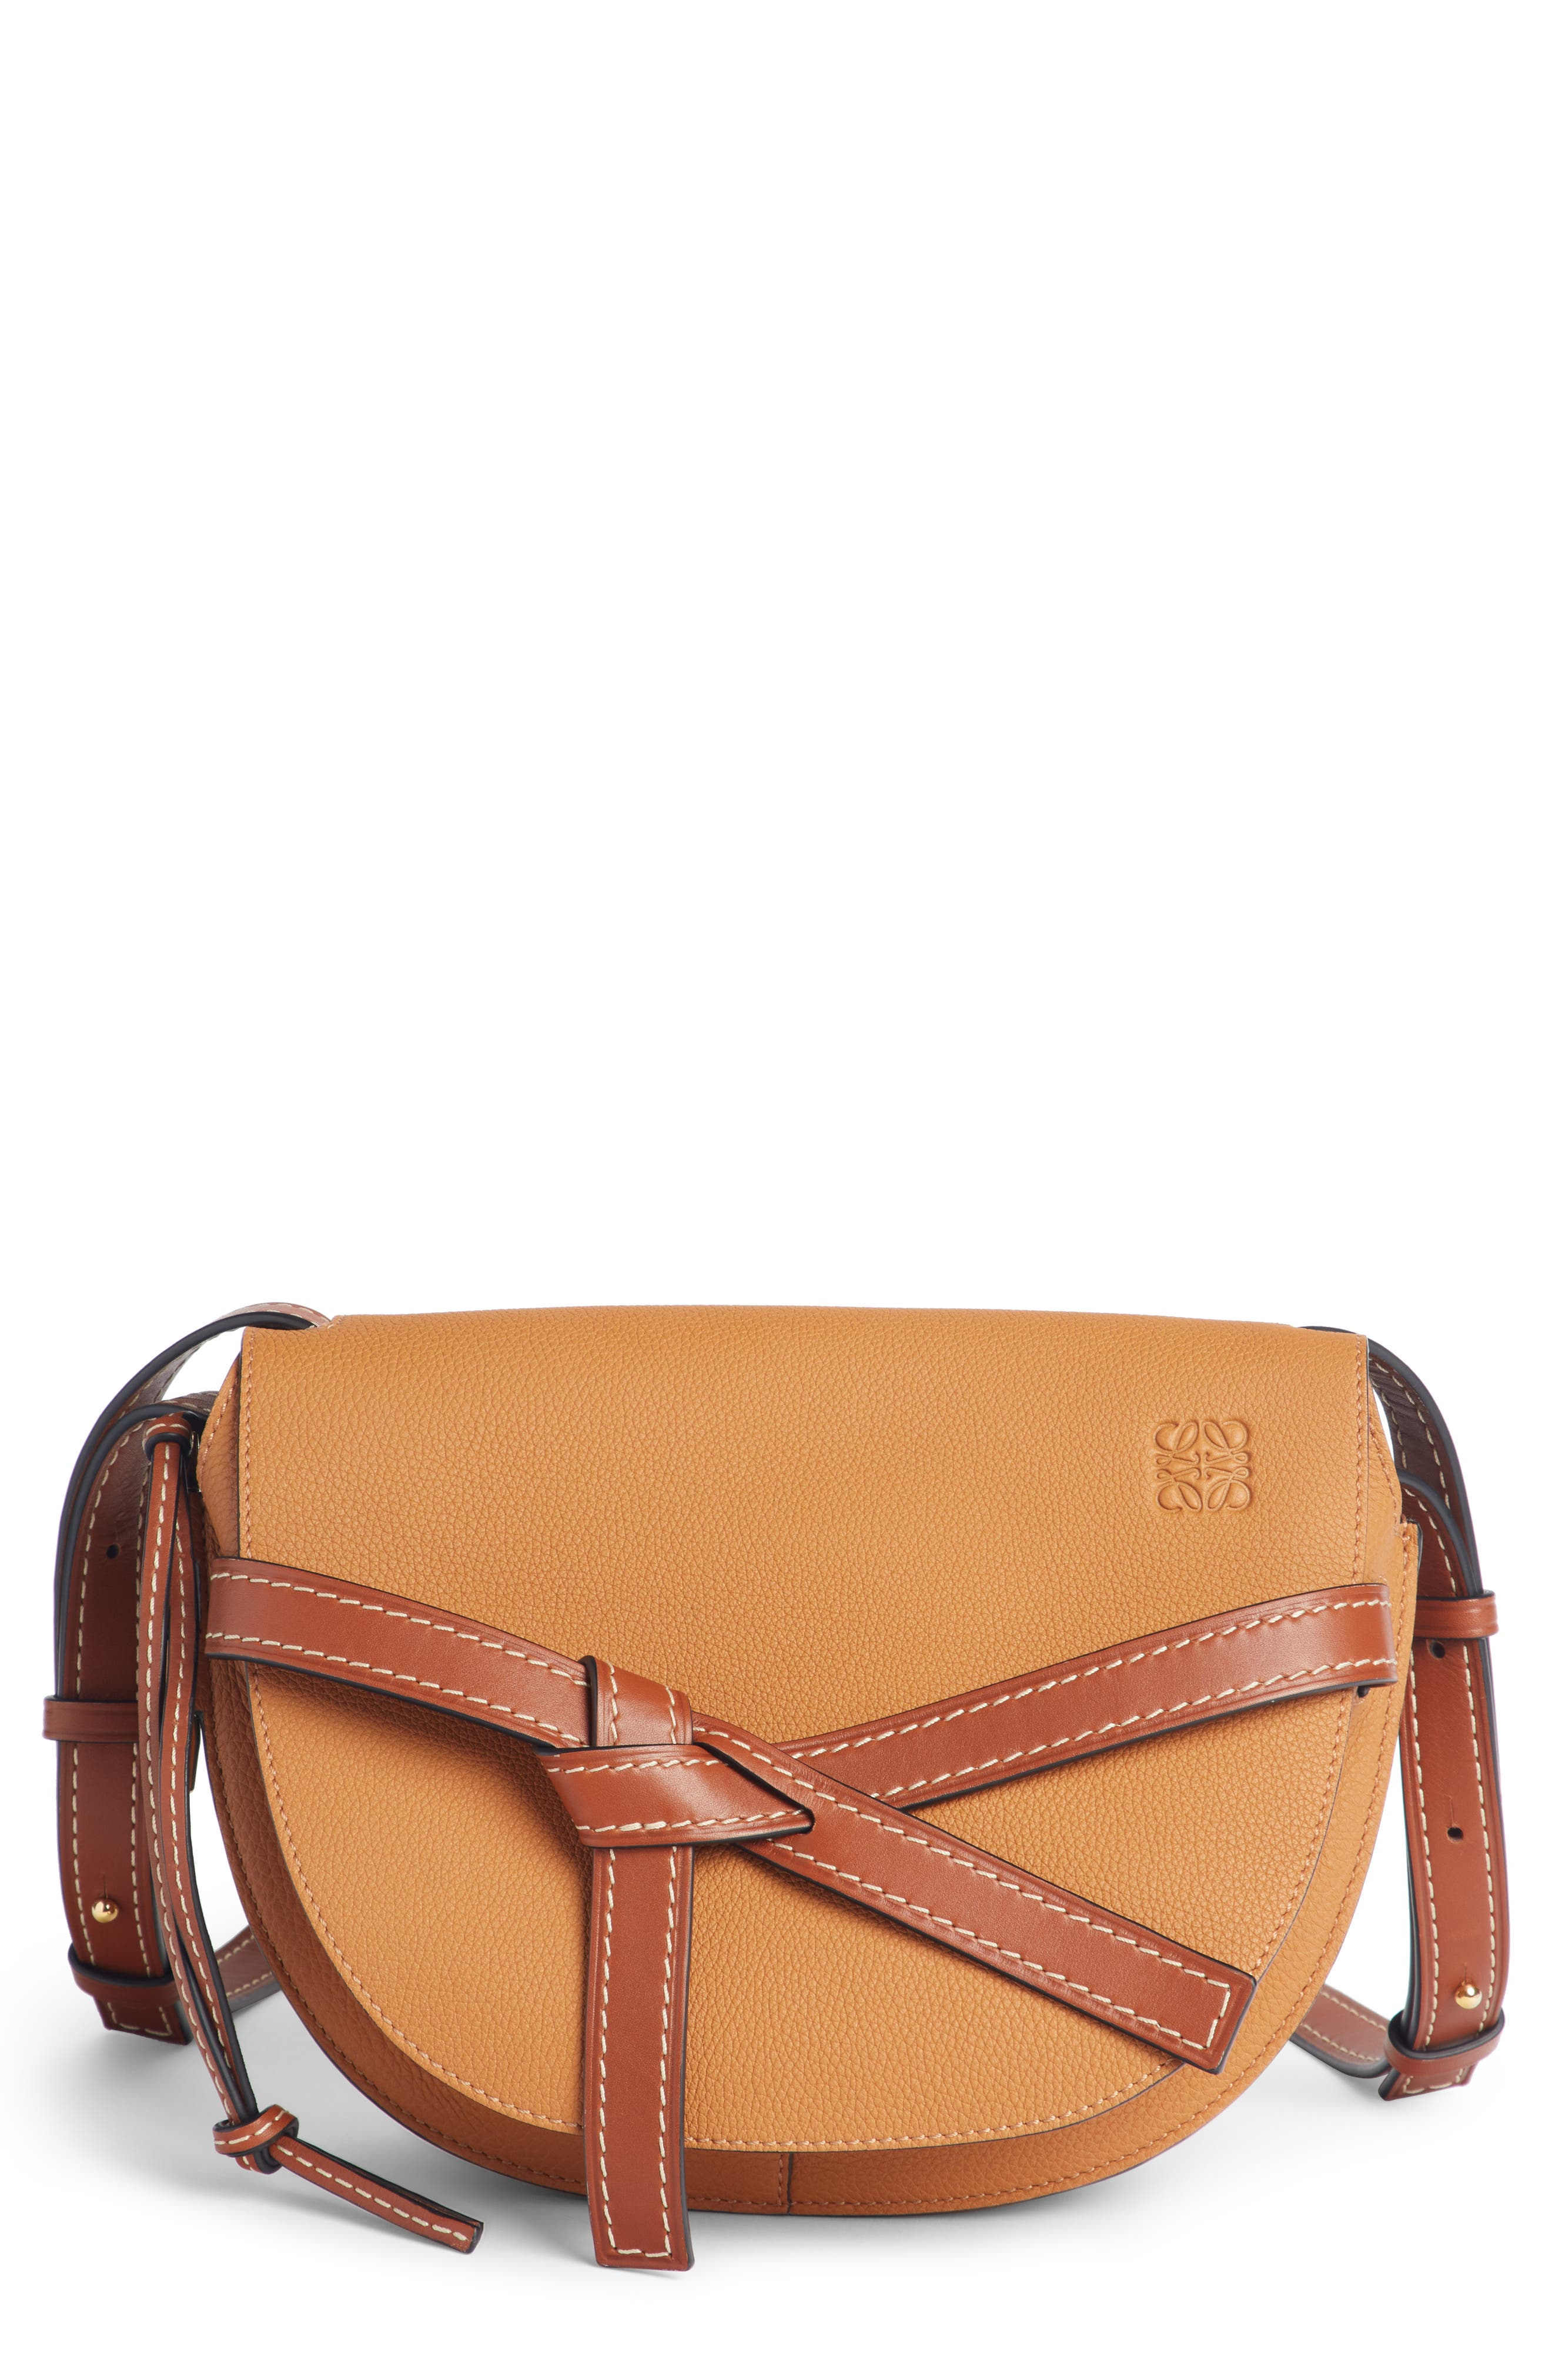 Small Gate Leather Crossbody Bag,                         Main,                         color, LIGHT CARAMEL/ PECAN